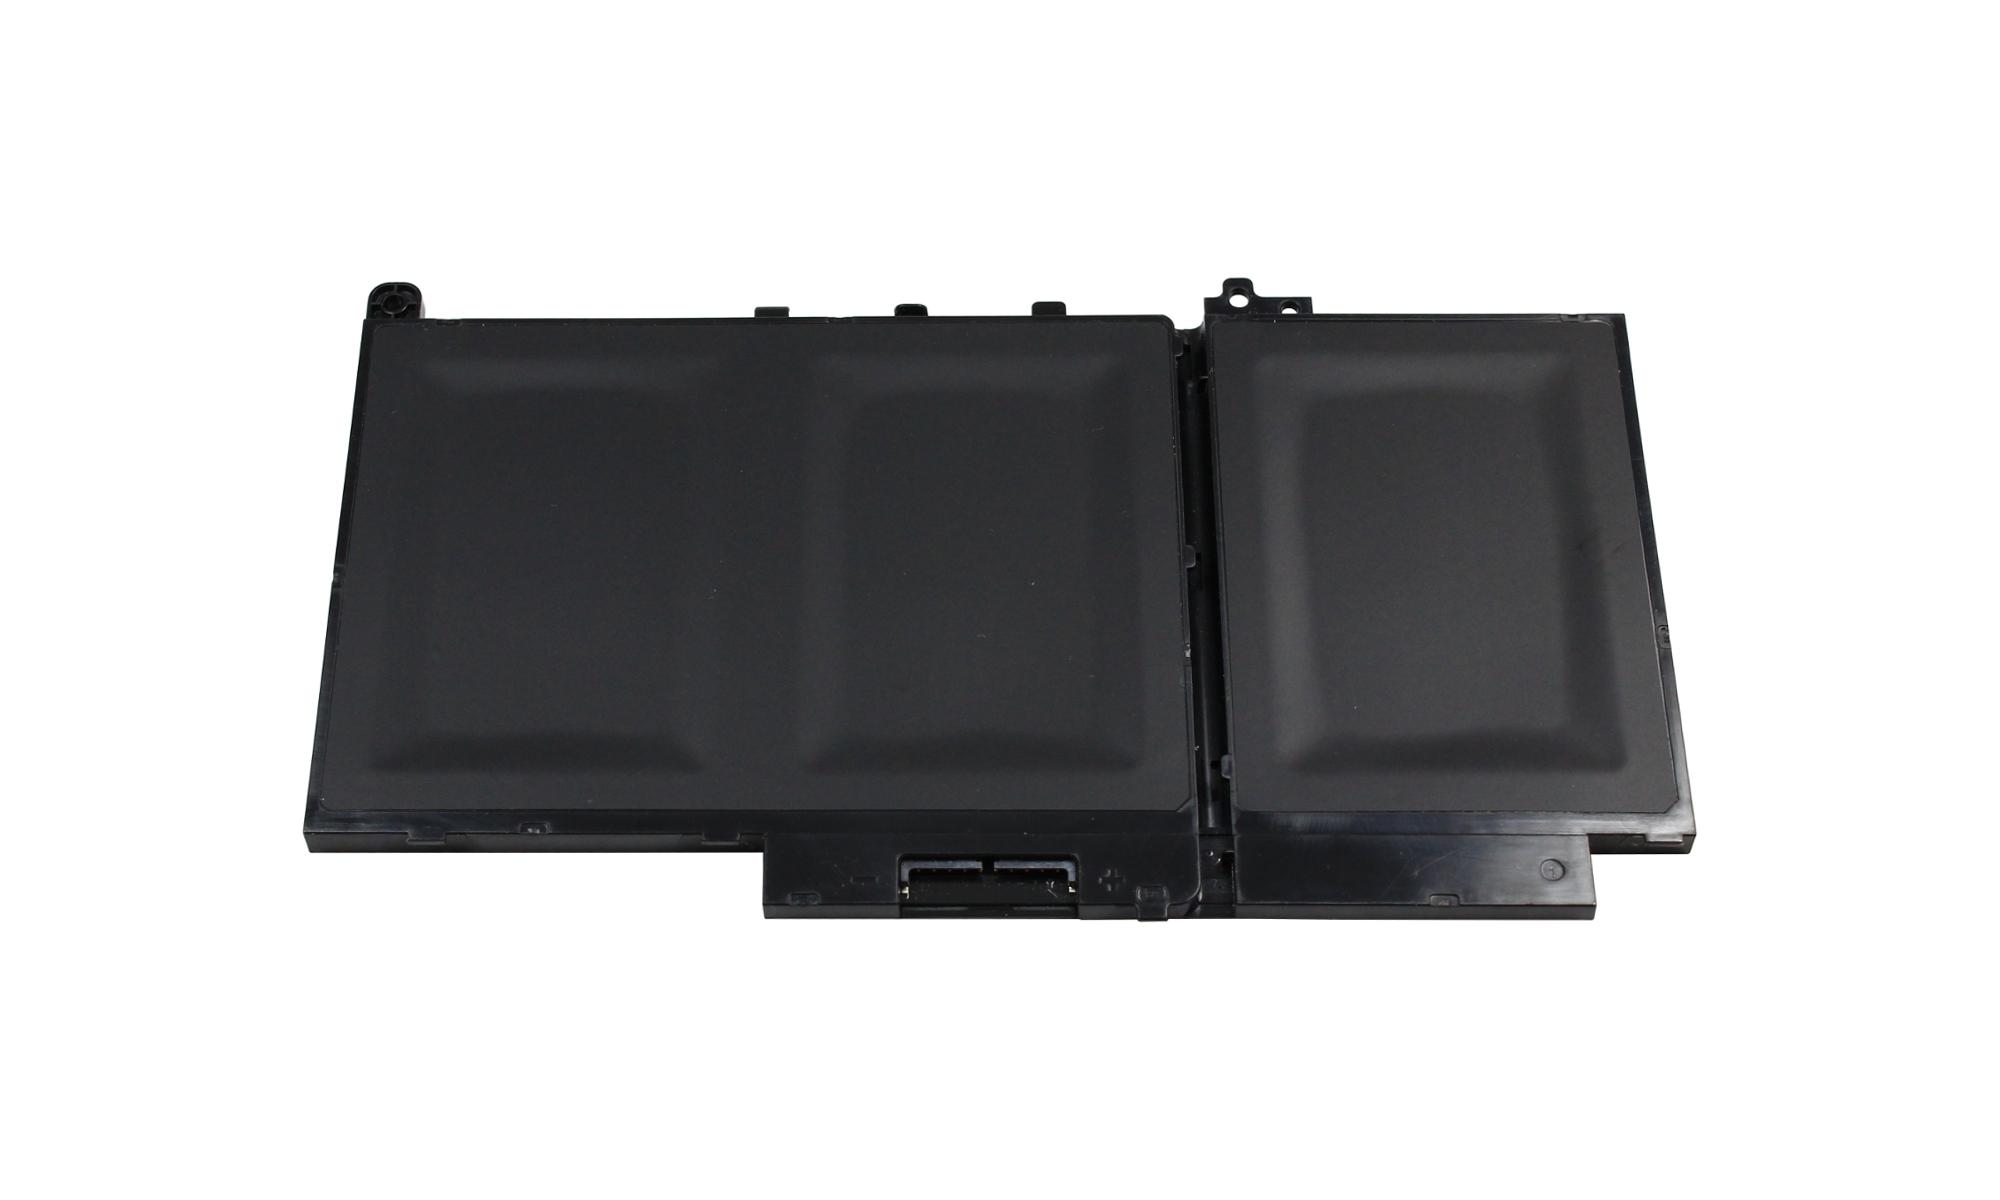 Baterie originala Dell Latitude E7270, 3 celule 42Wh